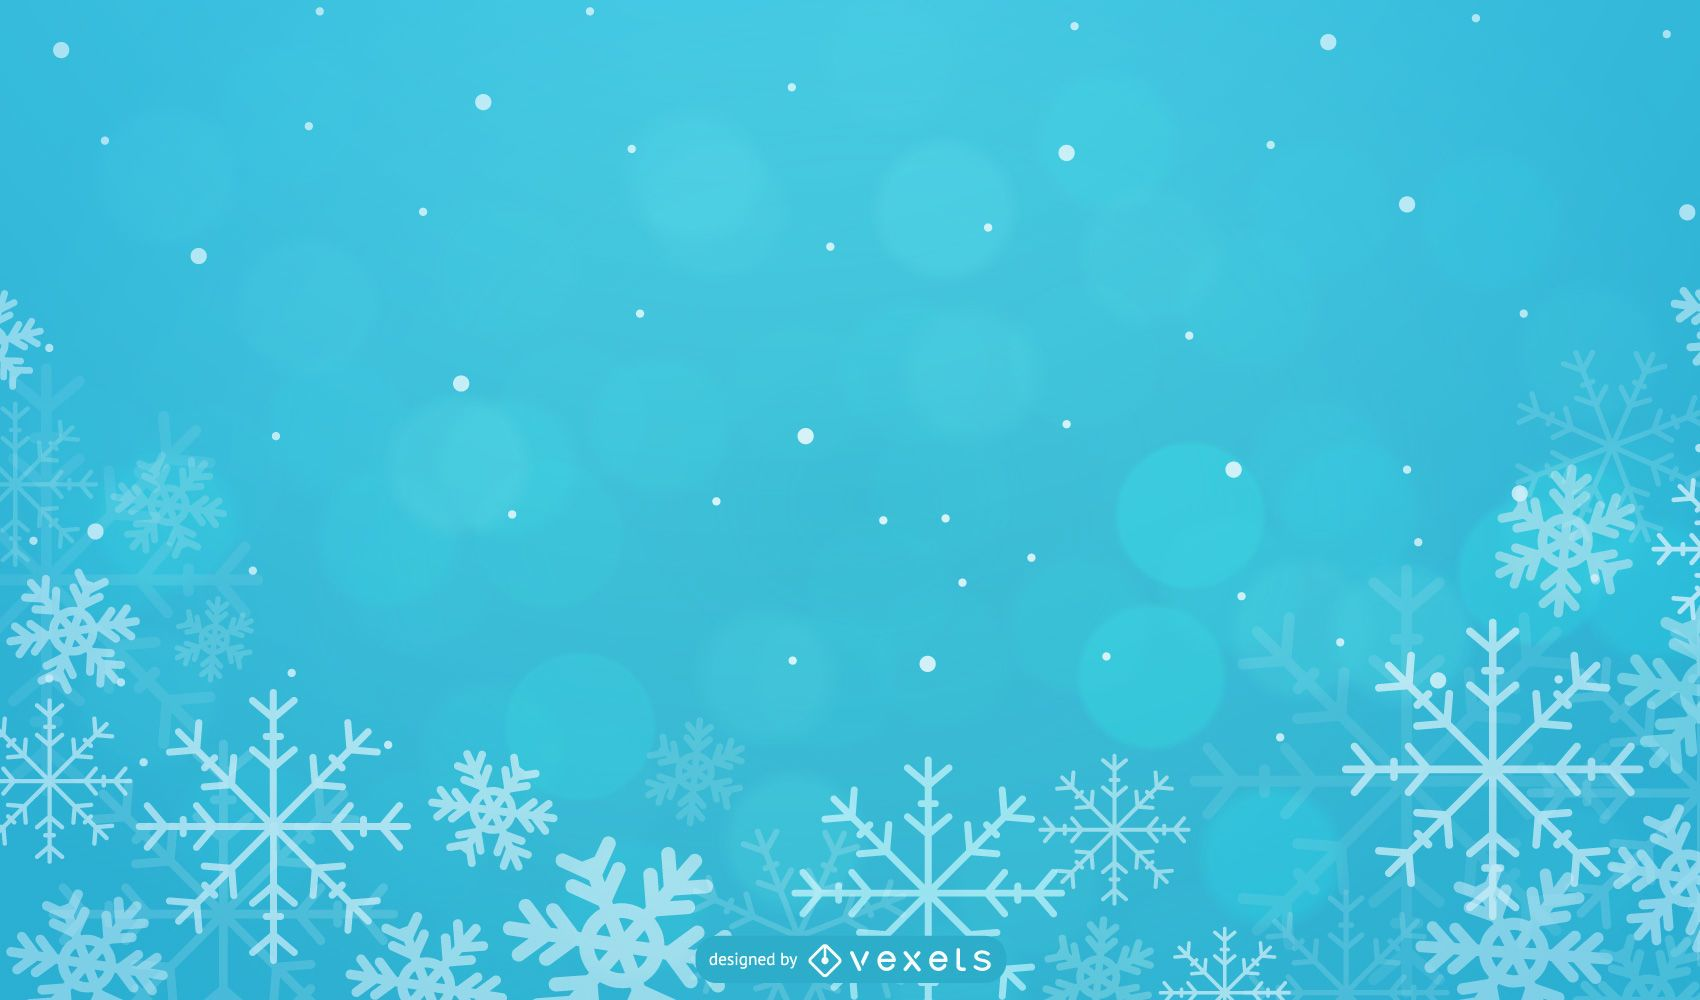 Seasonal Xmas Background with Snowflakes